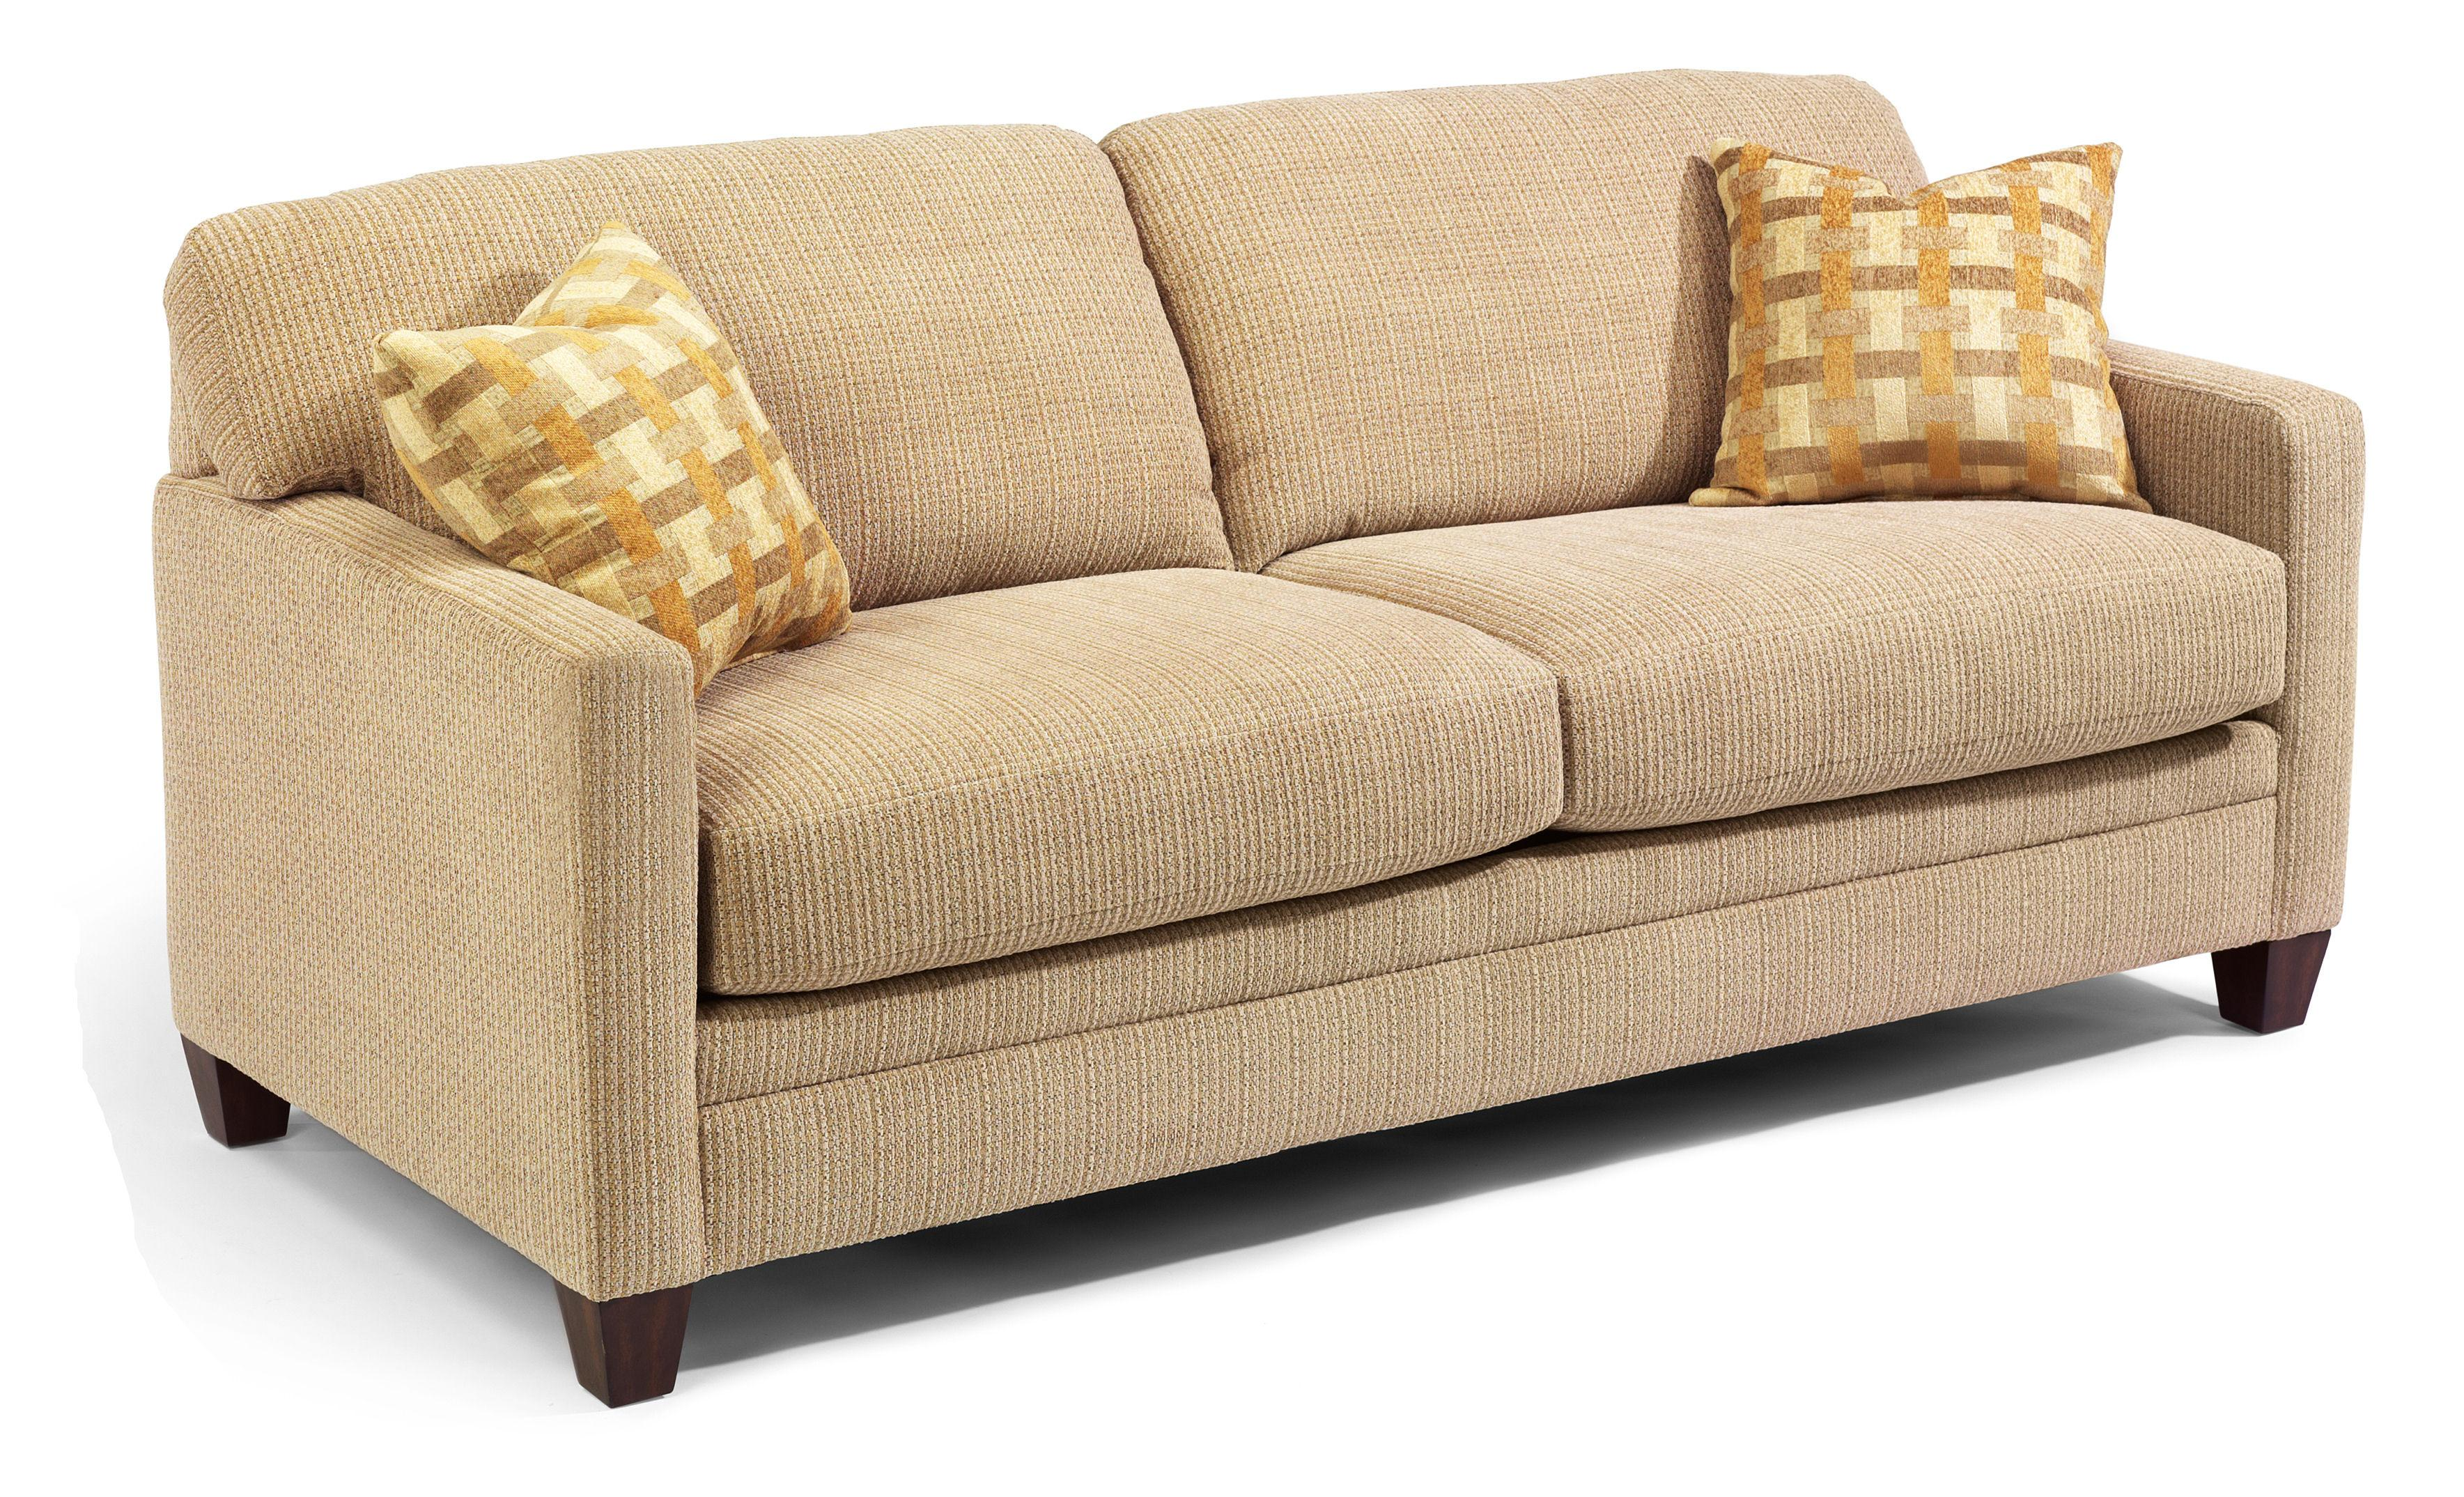 flexsteel serendipity 5552 44 upholstered queen sofa sleeper hudson 39 s furniture sofa sleeper. Black Bedroom Furniture Sets. Home Design Ideas